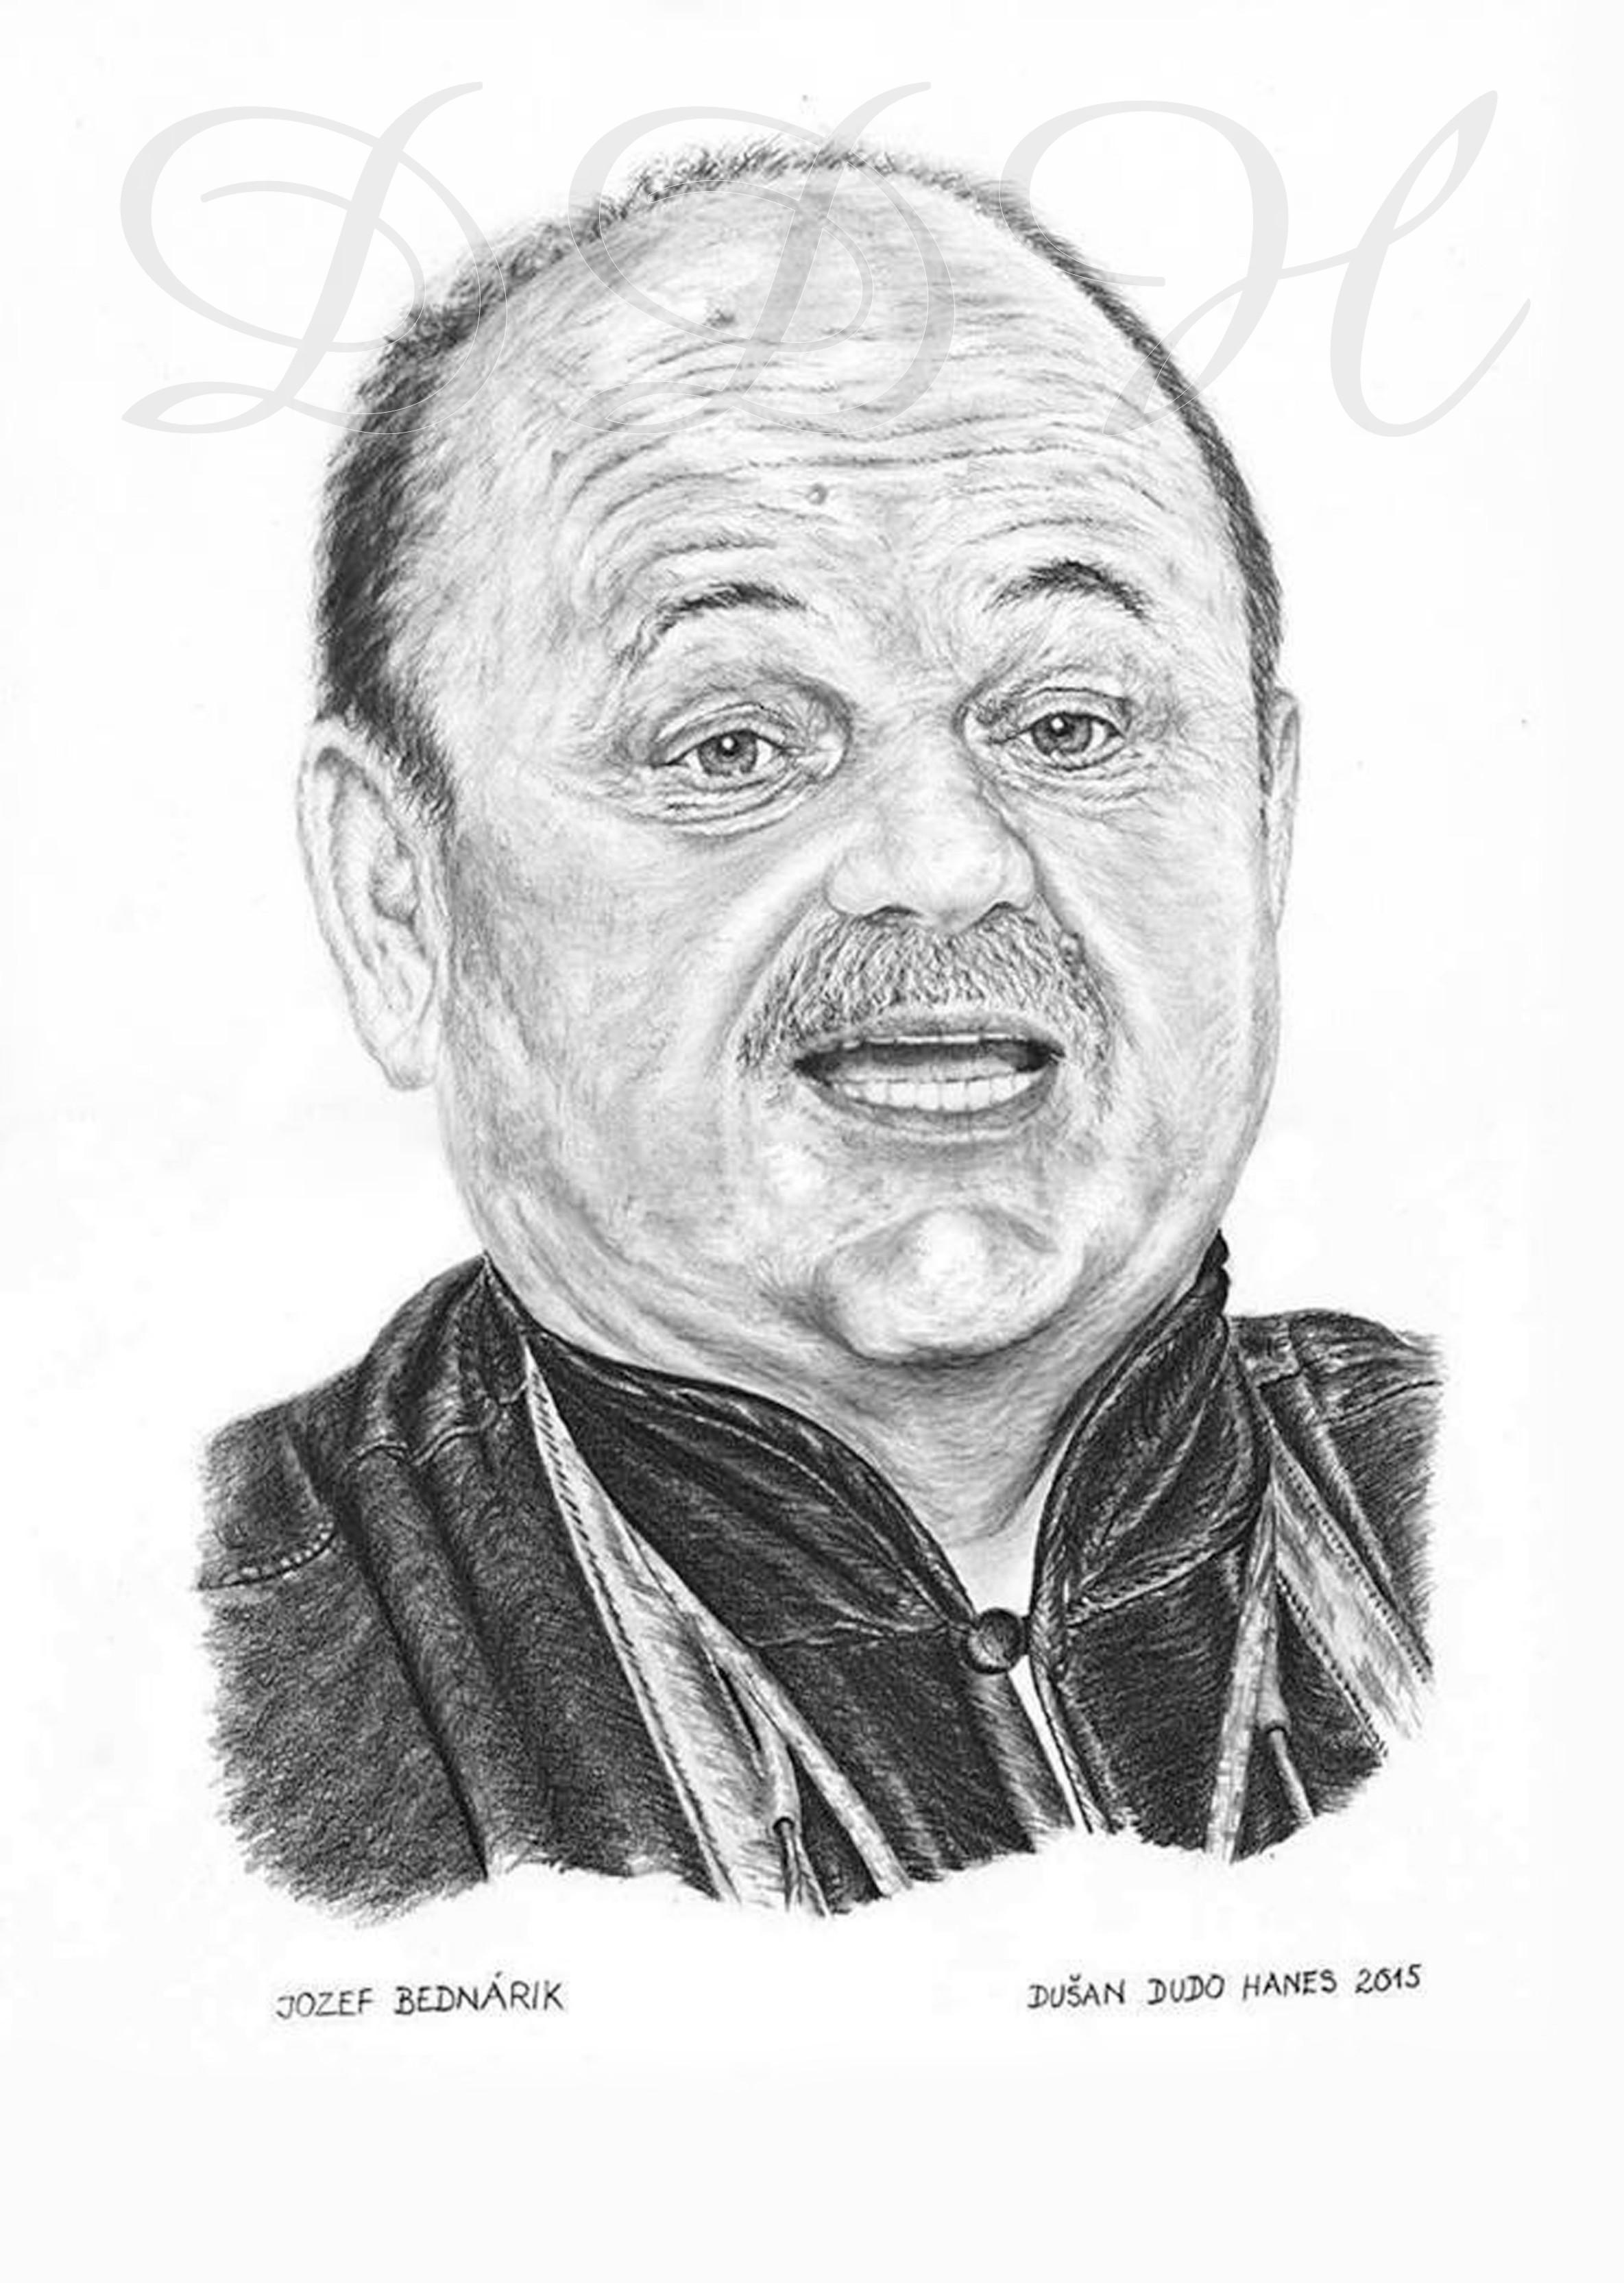 132 - Jozef Bednárik, portrét Dušan Dudo Hanes